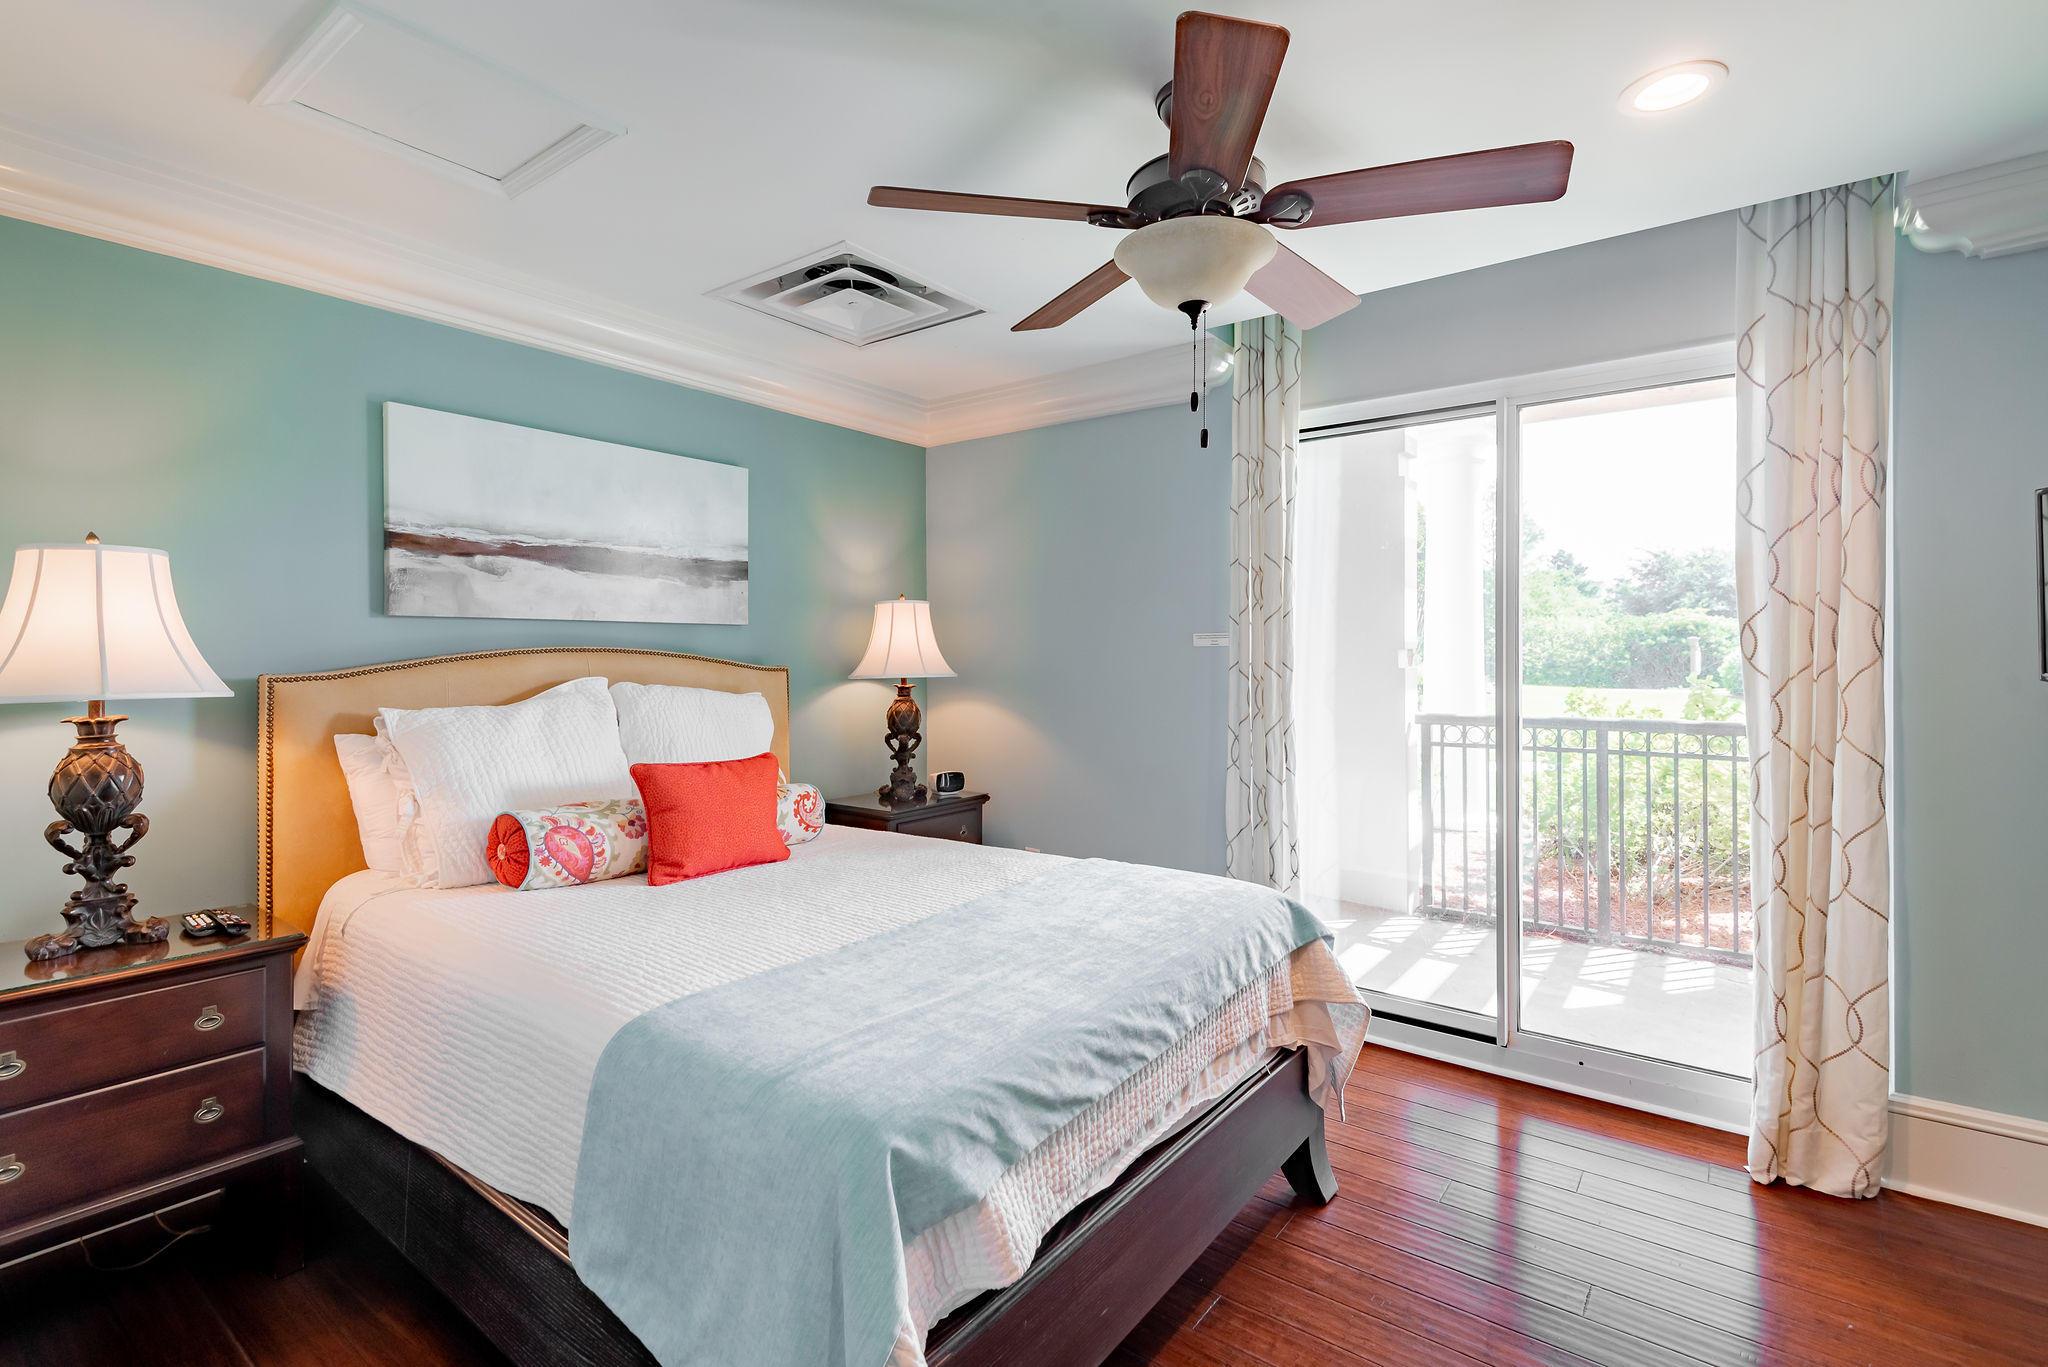 Renaissance On Chas Harbor Homes For Sale - 211 Plaza, Mount Pleasant, SC - 28